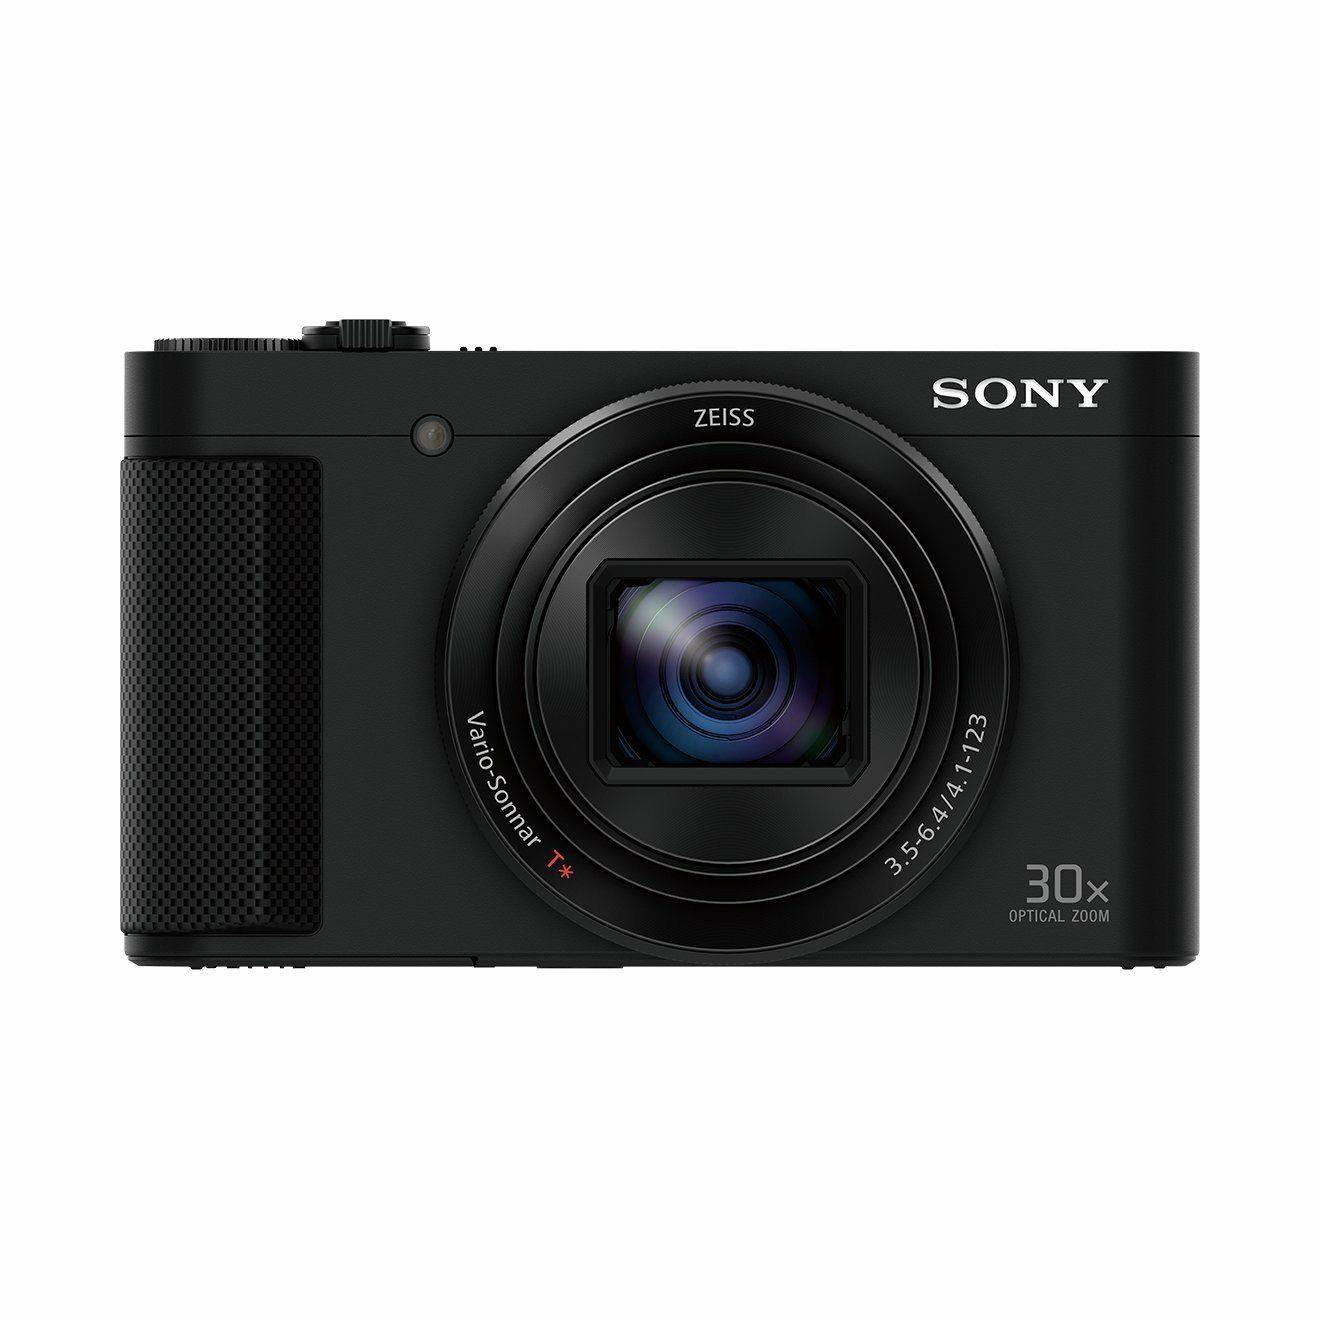 Appareil photo compact Sony Cyber-SHOT DSC-HX90